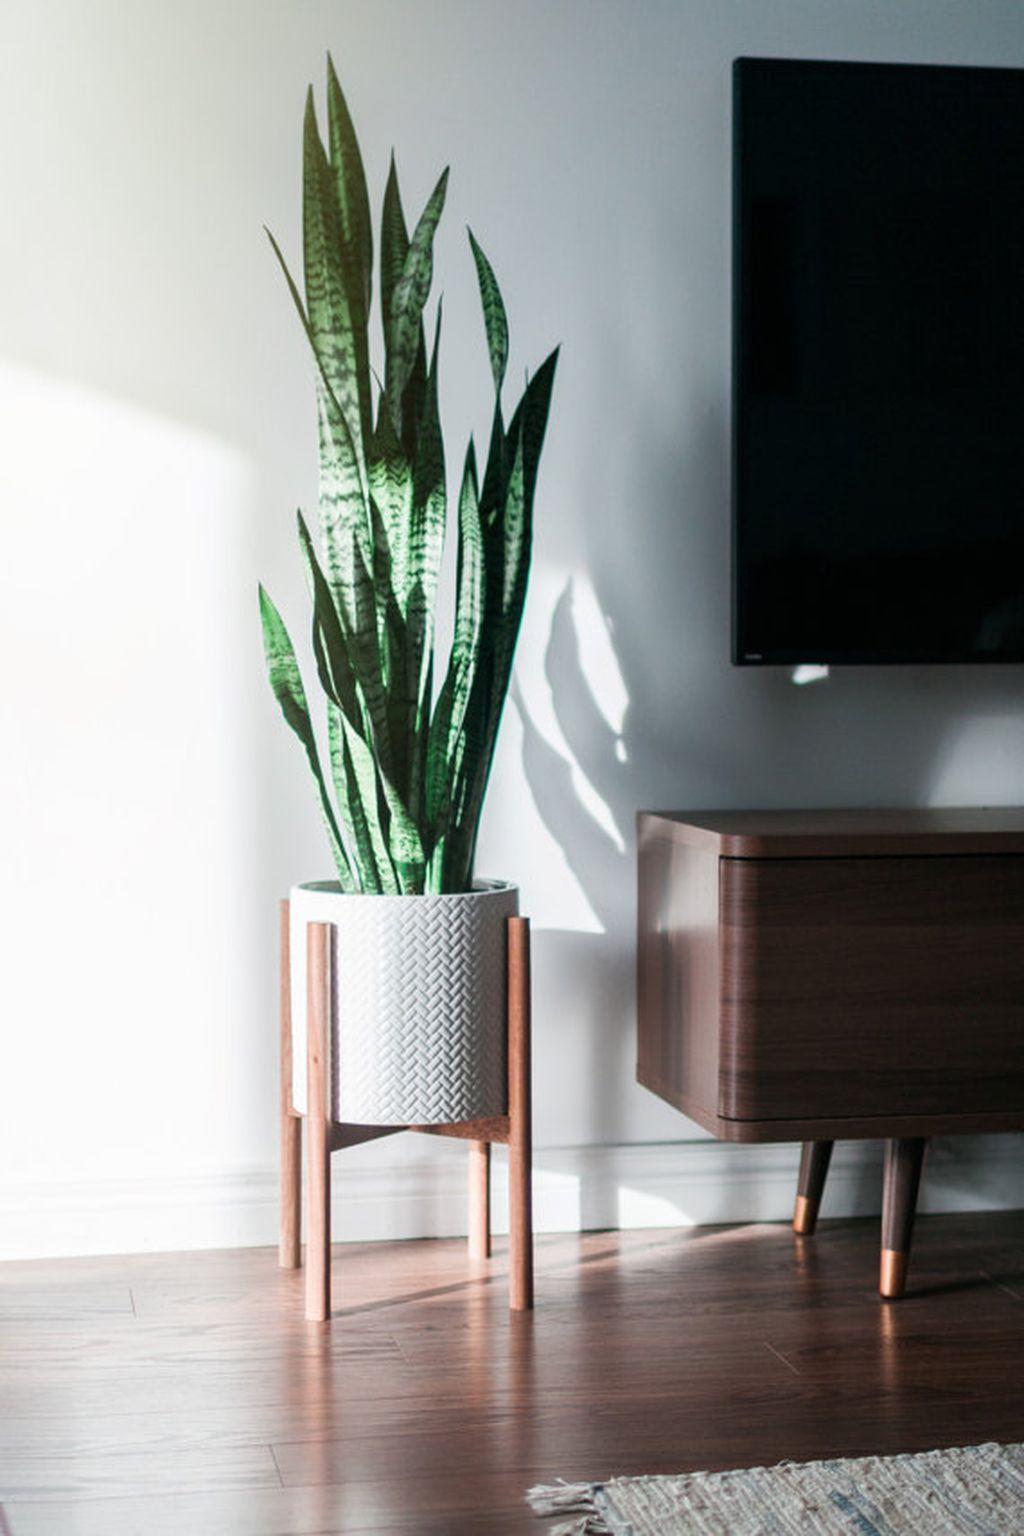 Inspiring Indoor Plans Garden Ideas To Makes Your Home More Cozier 73